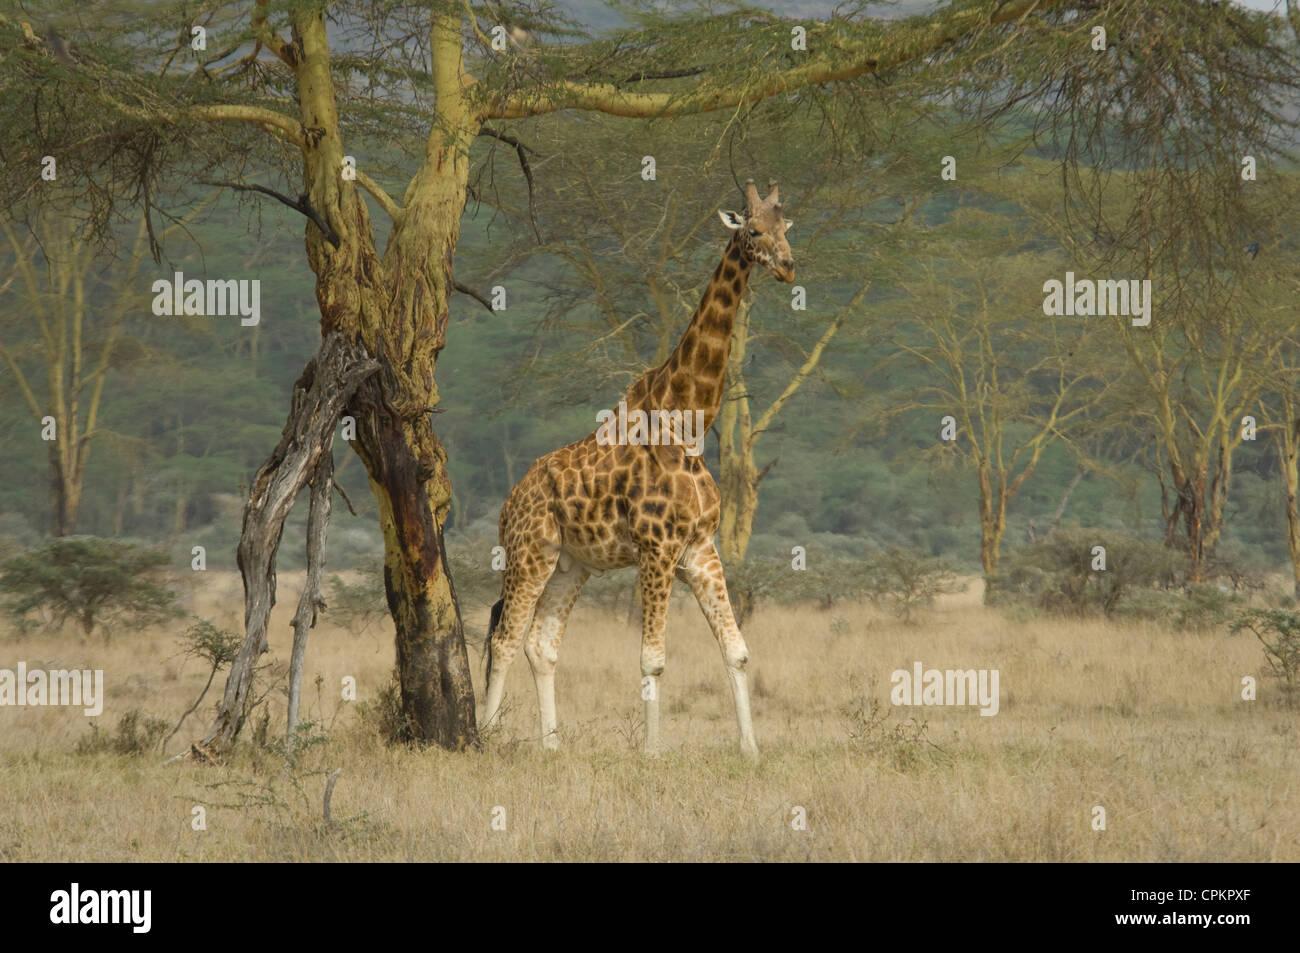 Rothschild's giraffe by Yellow-barked acacia tree - Stock Image